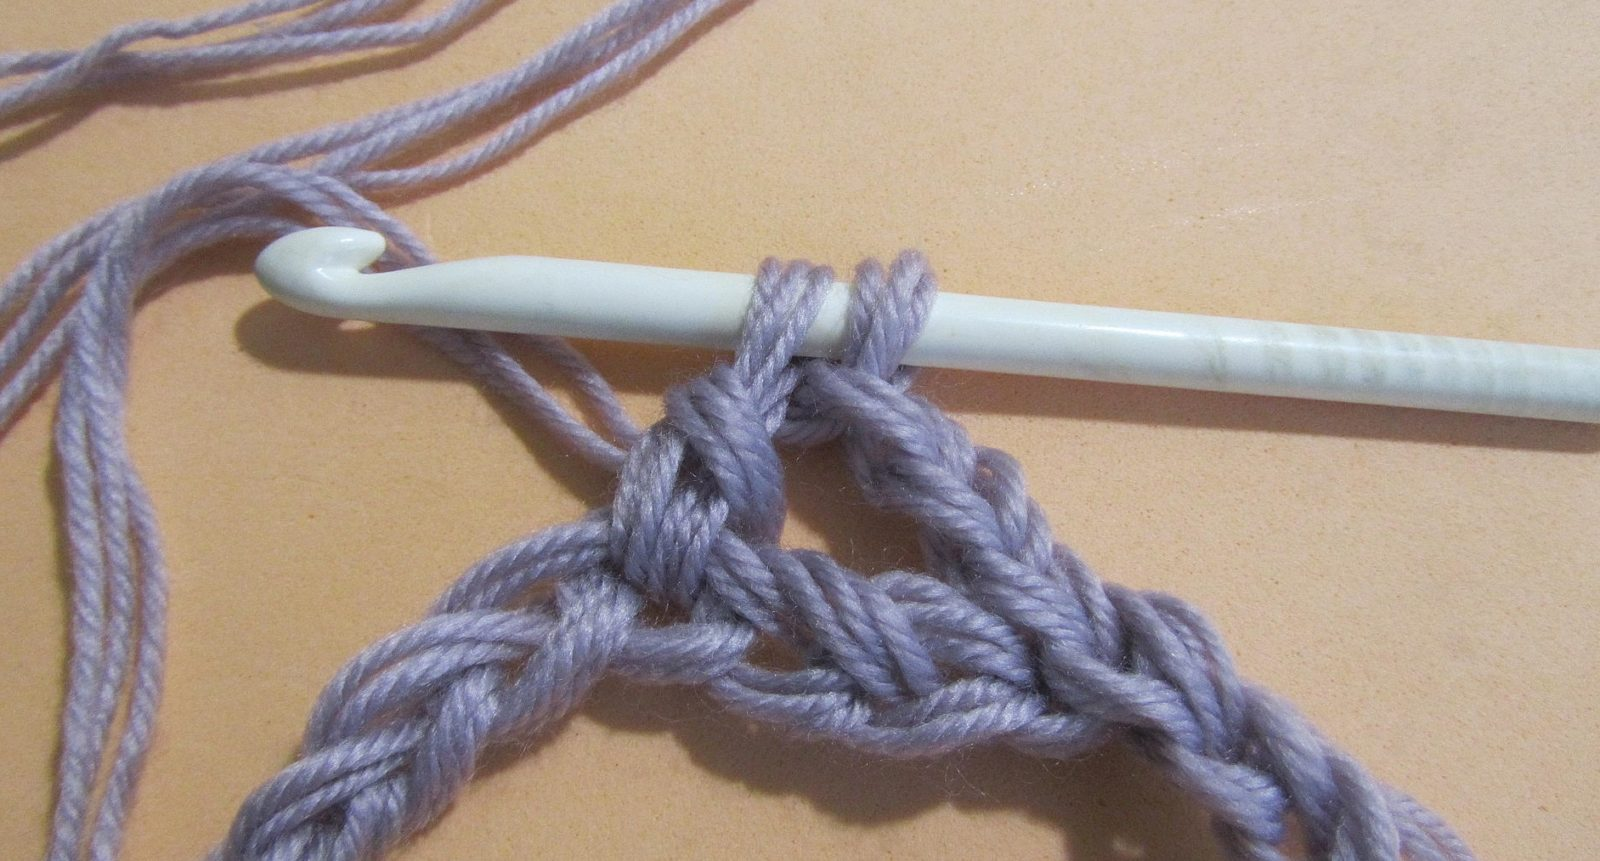 Узоры крючком: узоры для снуда шаг 4